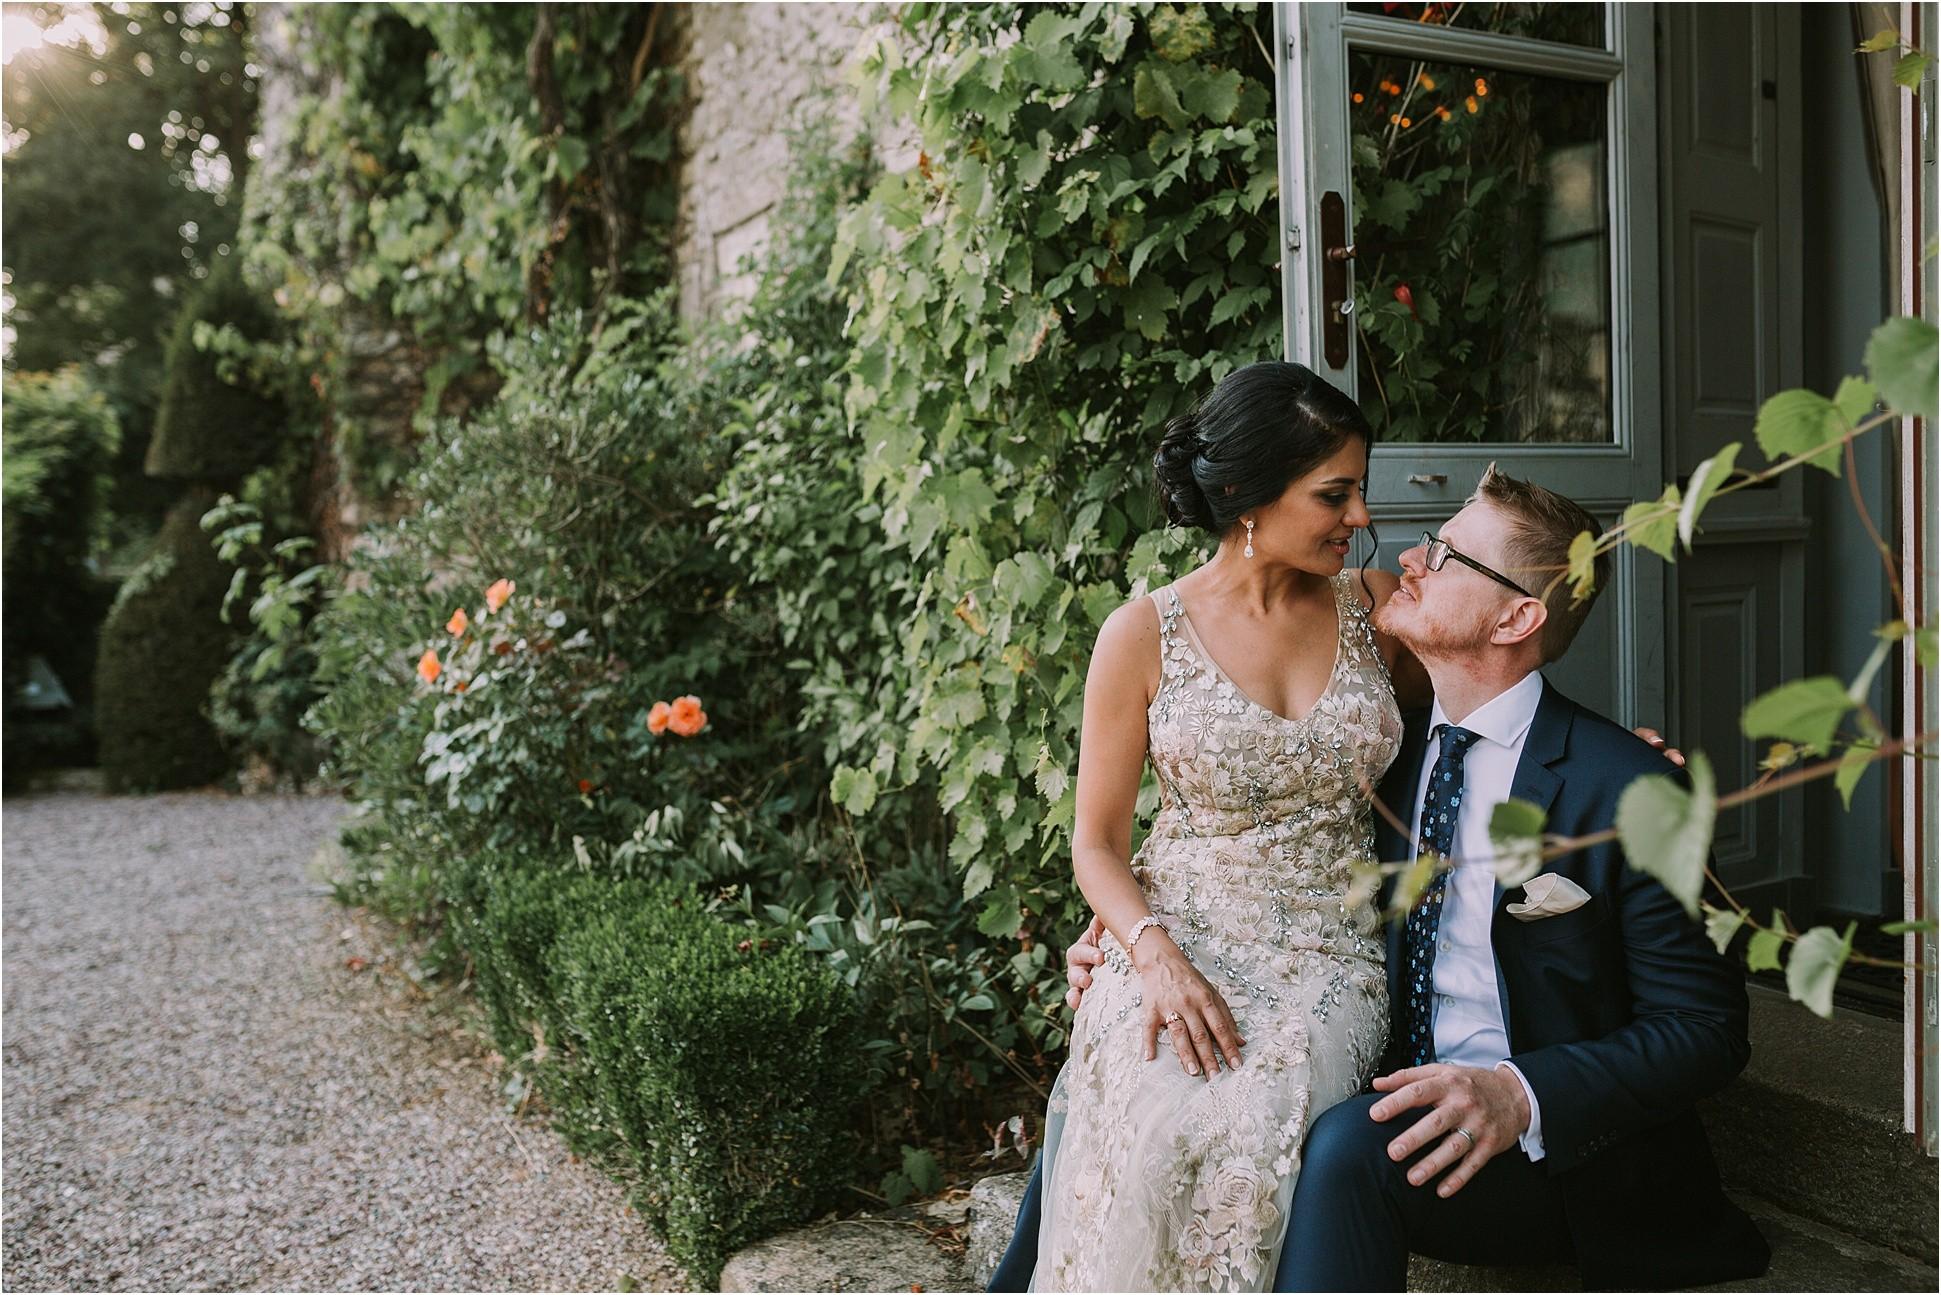 Kateryna-photos-photographe-mariage-chateau-st-paterne-mayenne-normandie_0186.jpg